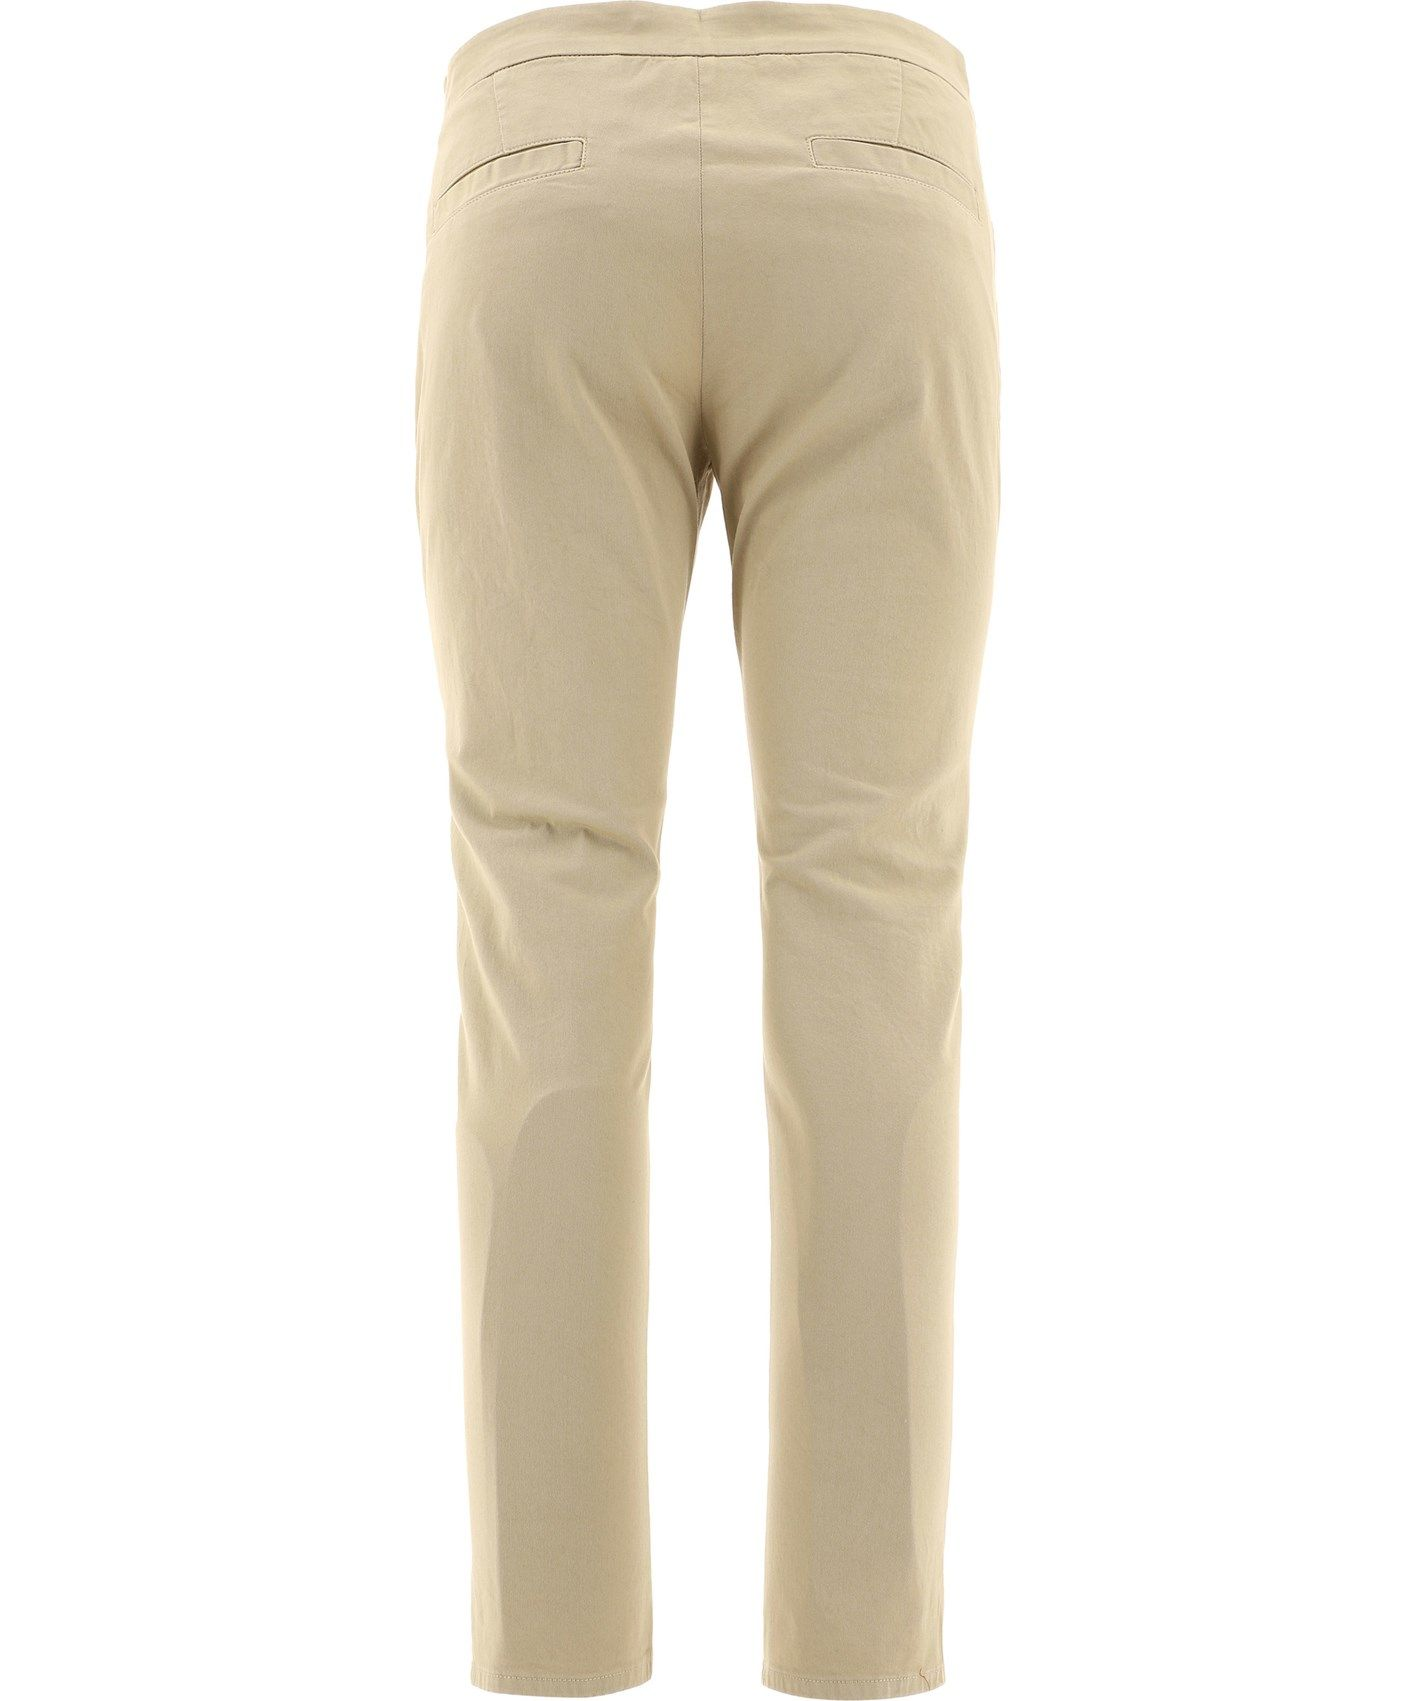 ASPESI Cottons ASPESI WOMEN'S BEIGE COTTON PANTS